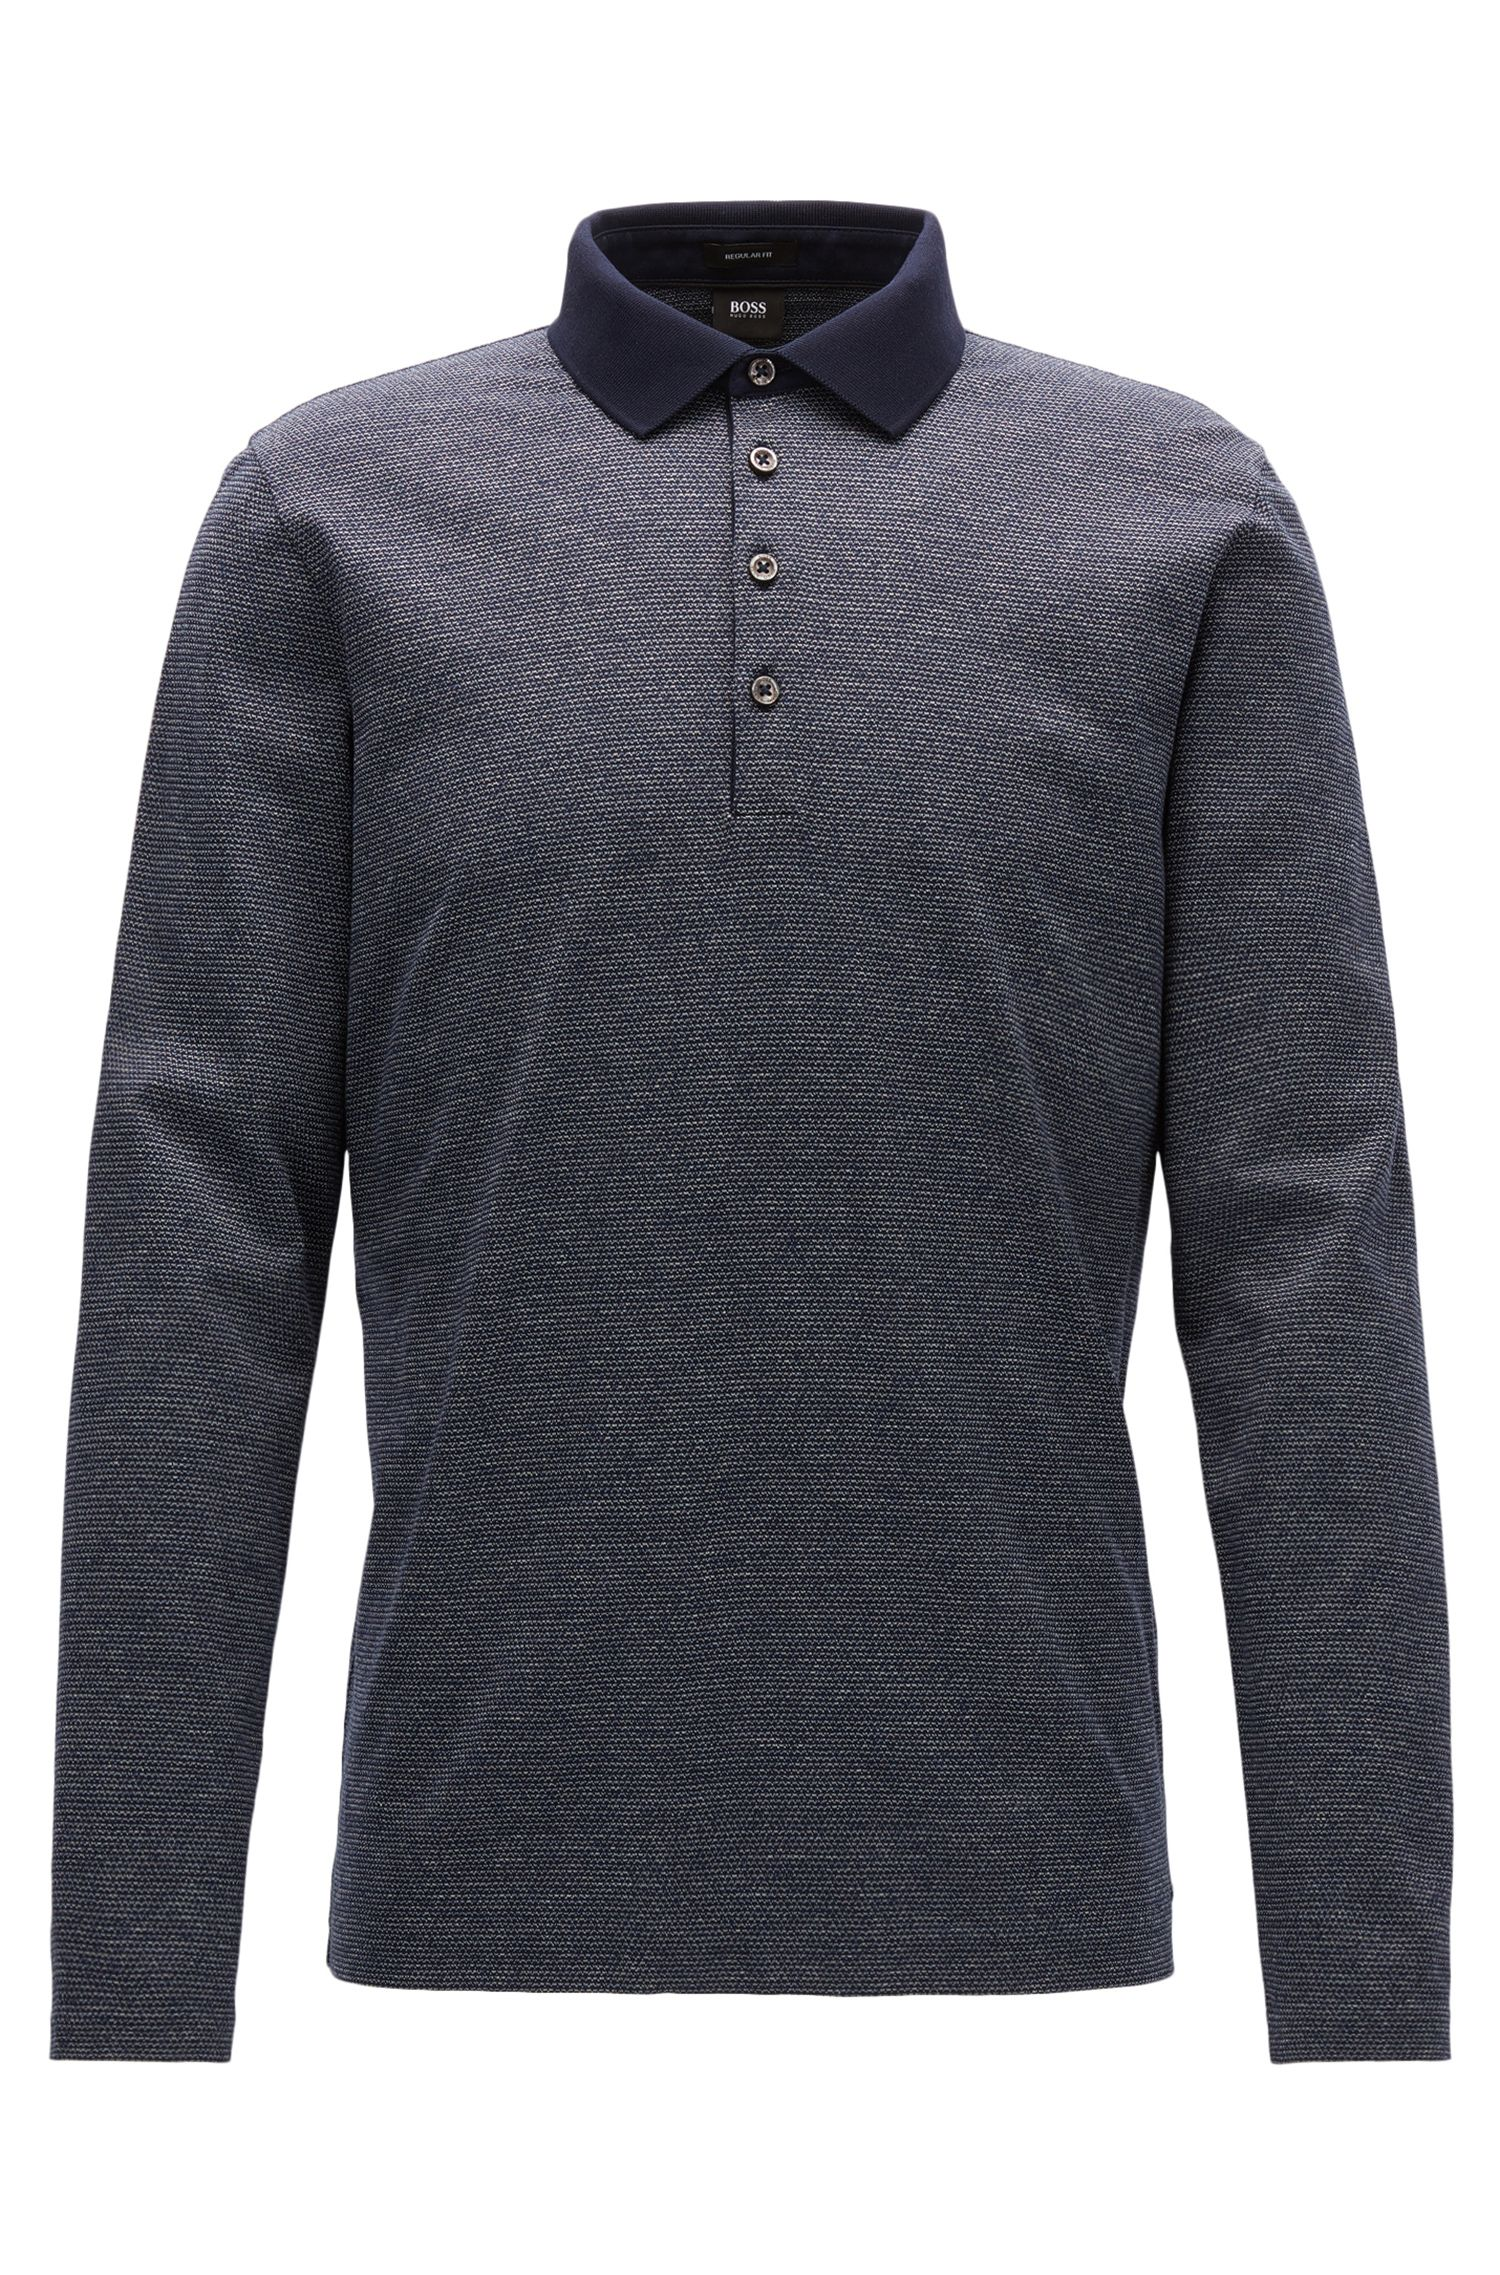 Fein gemustertes Regular-Fit Longsleeve Poloshirt aus merzerisierter Baumwolle